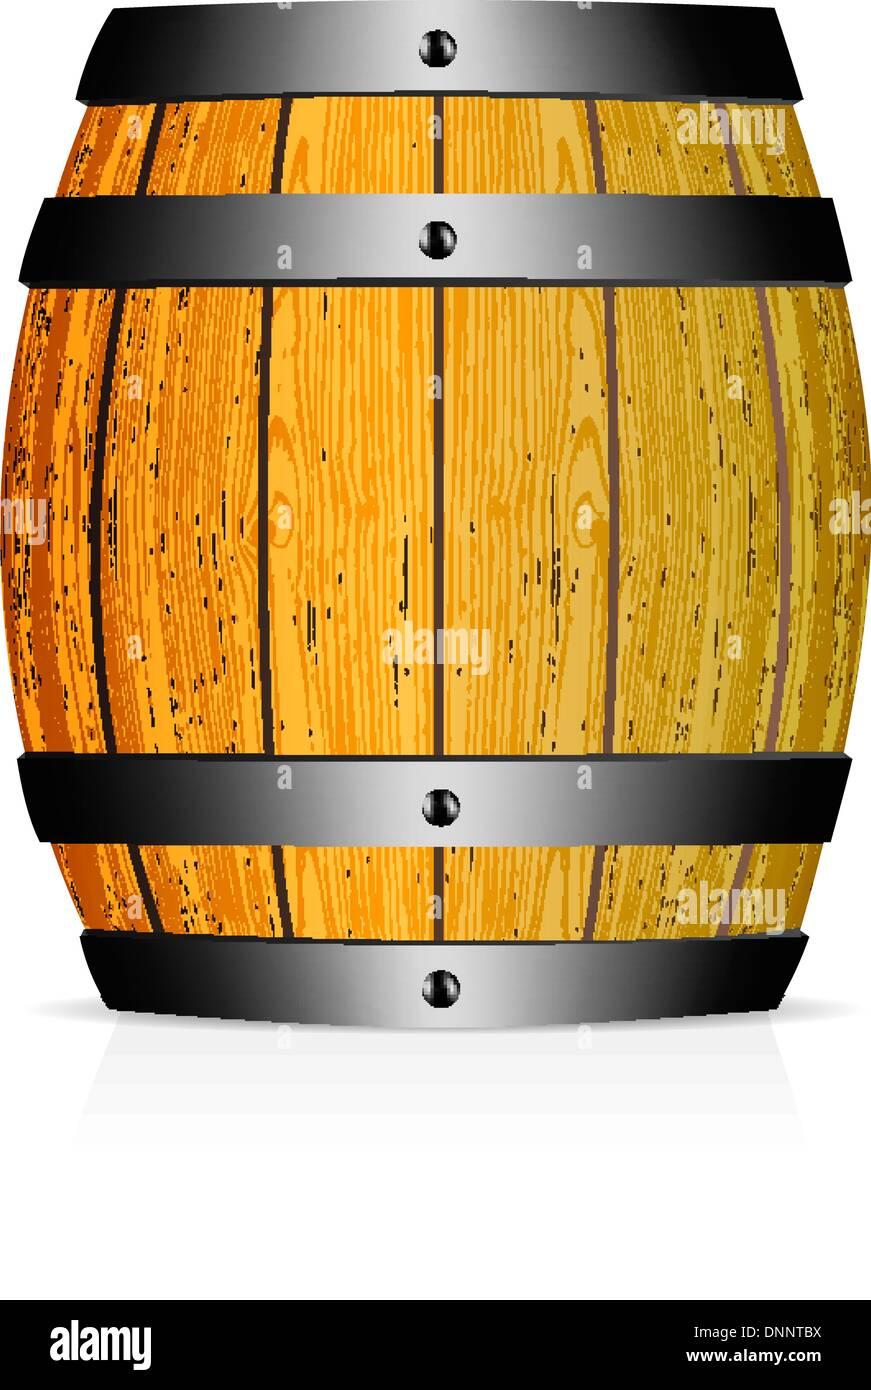 Wooden barrel vector illustration on white background - Stock Image